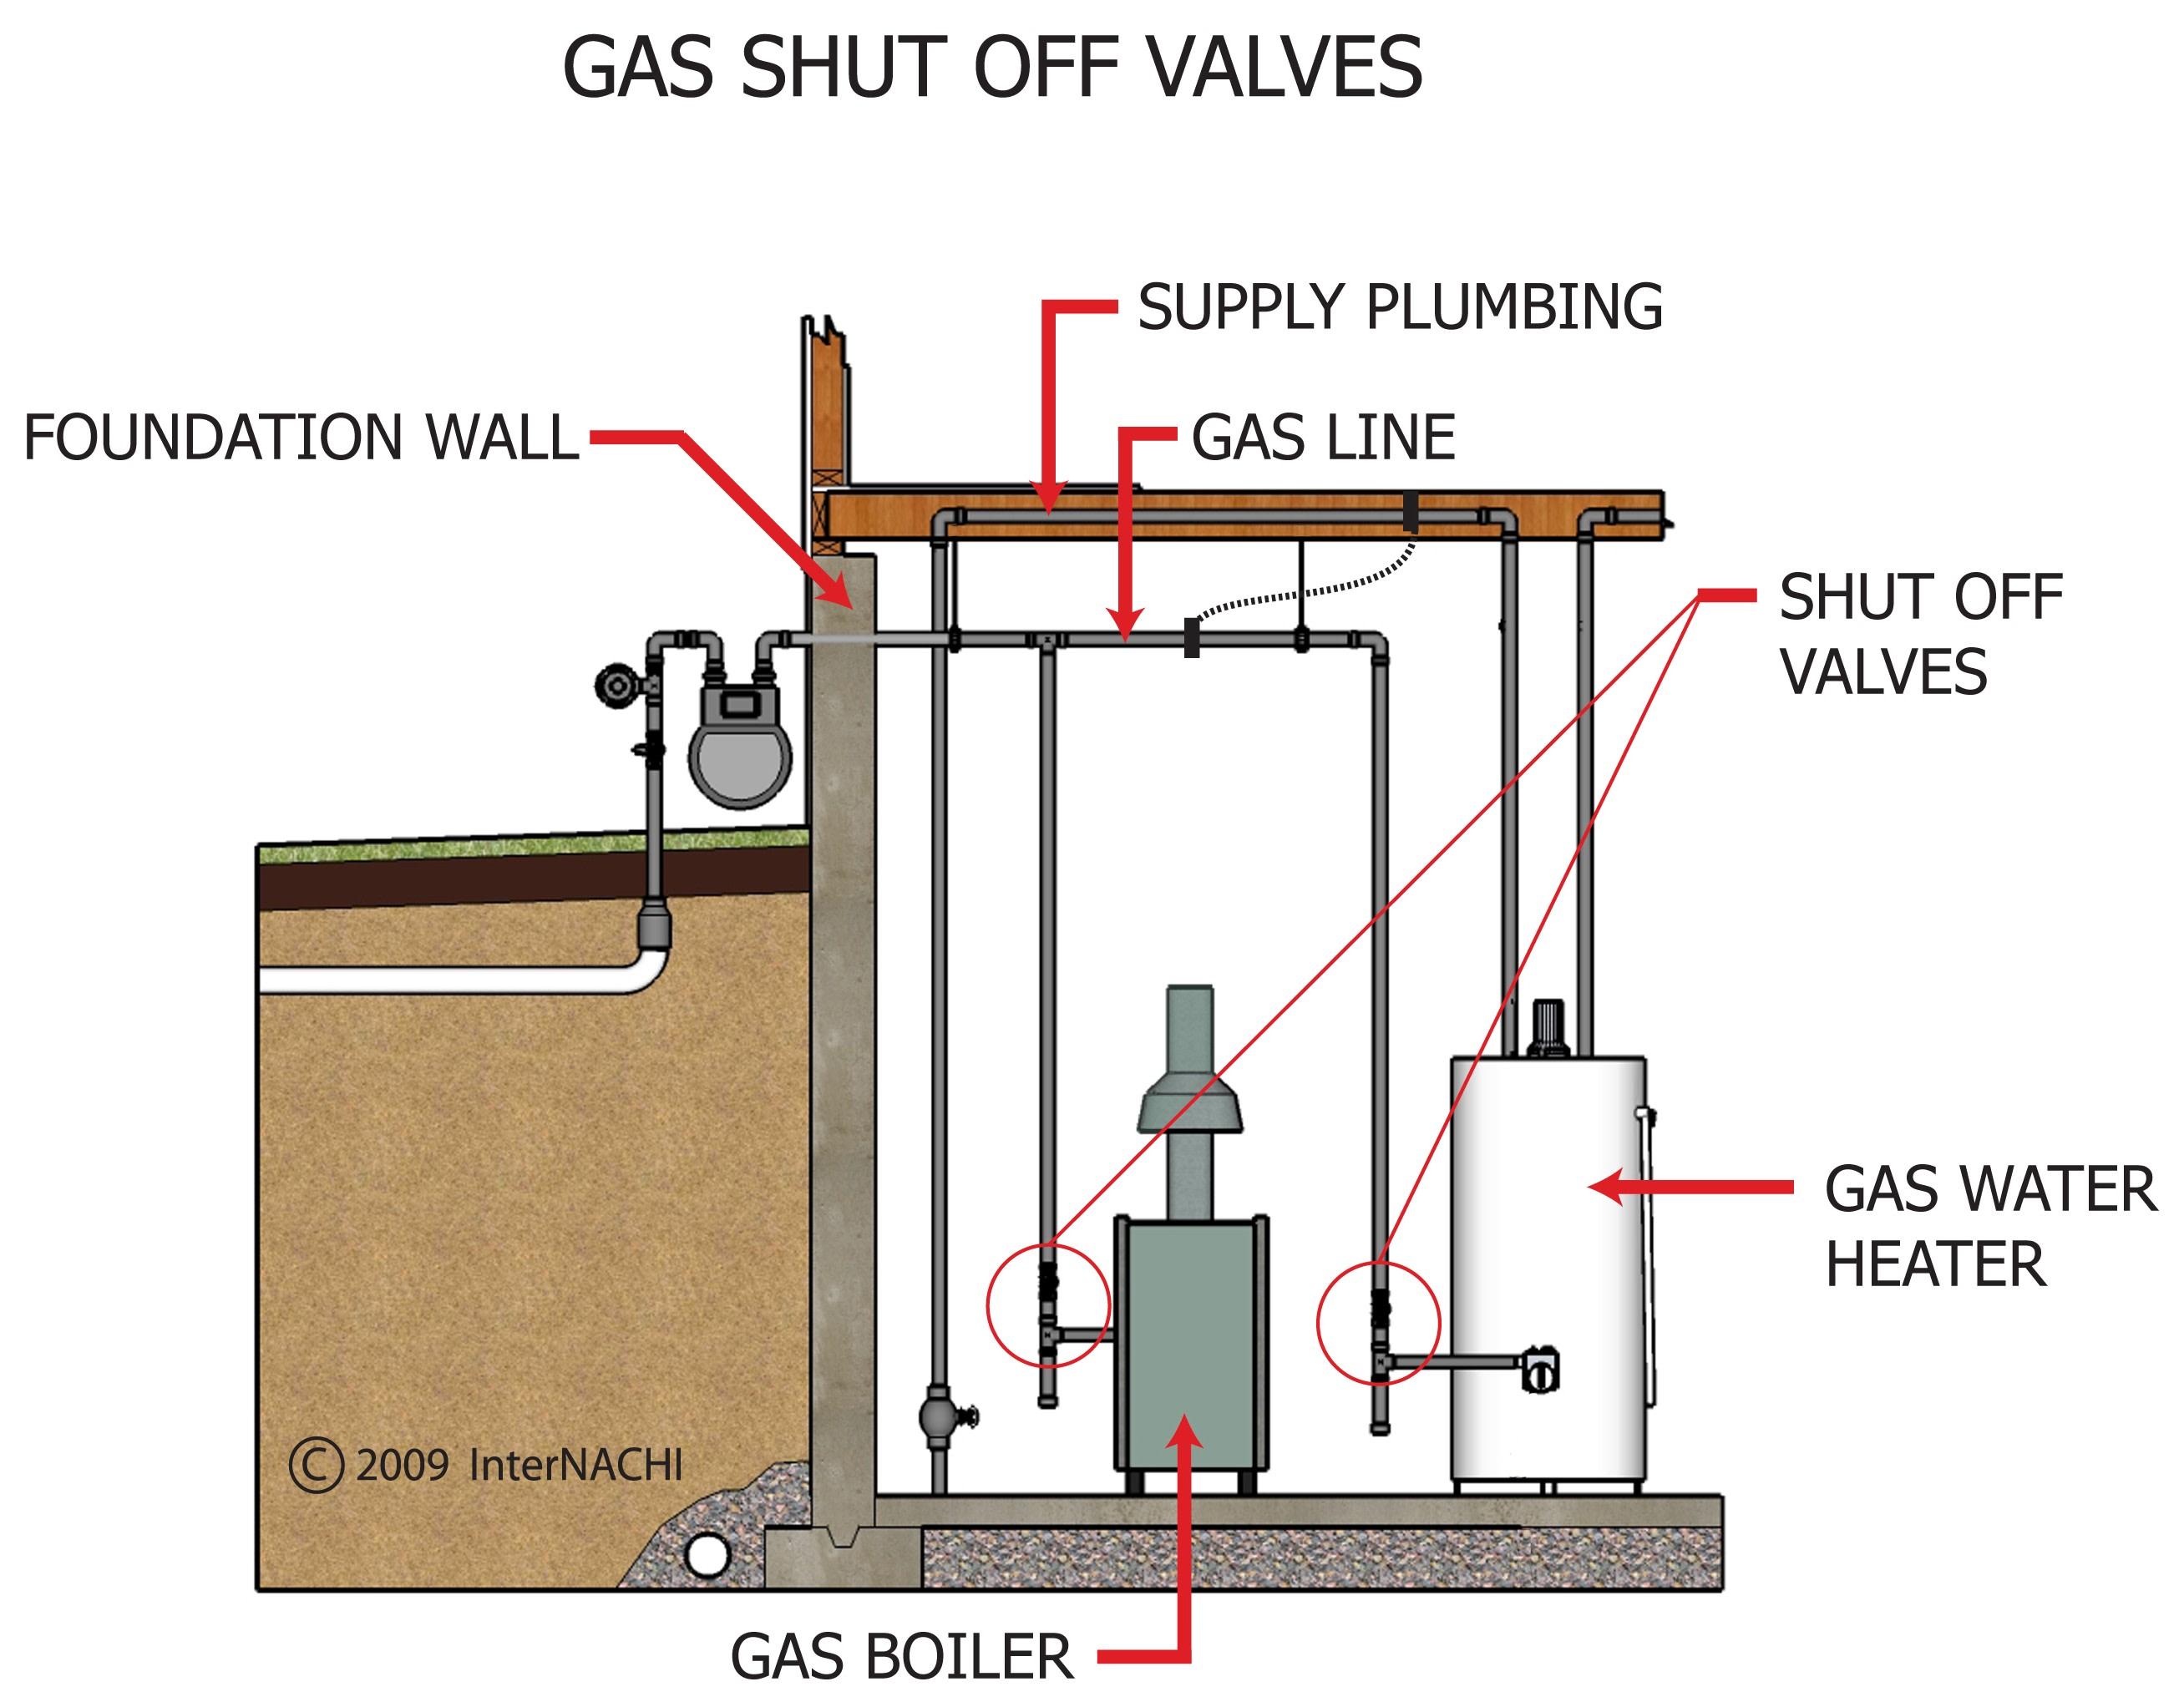 Gas shut off valves.